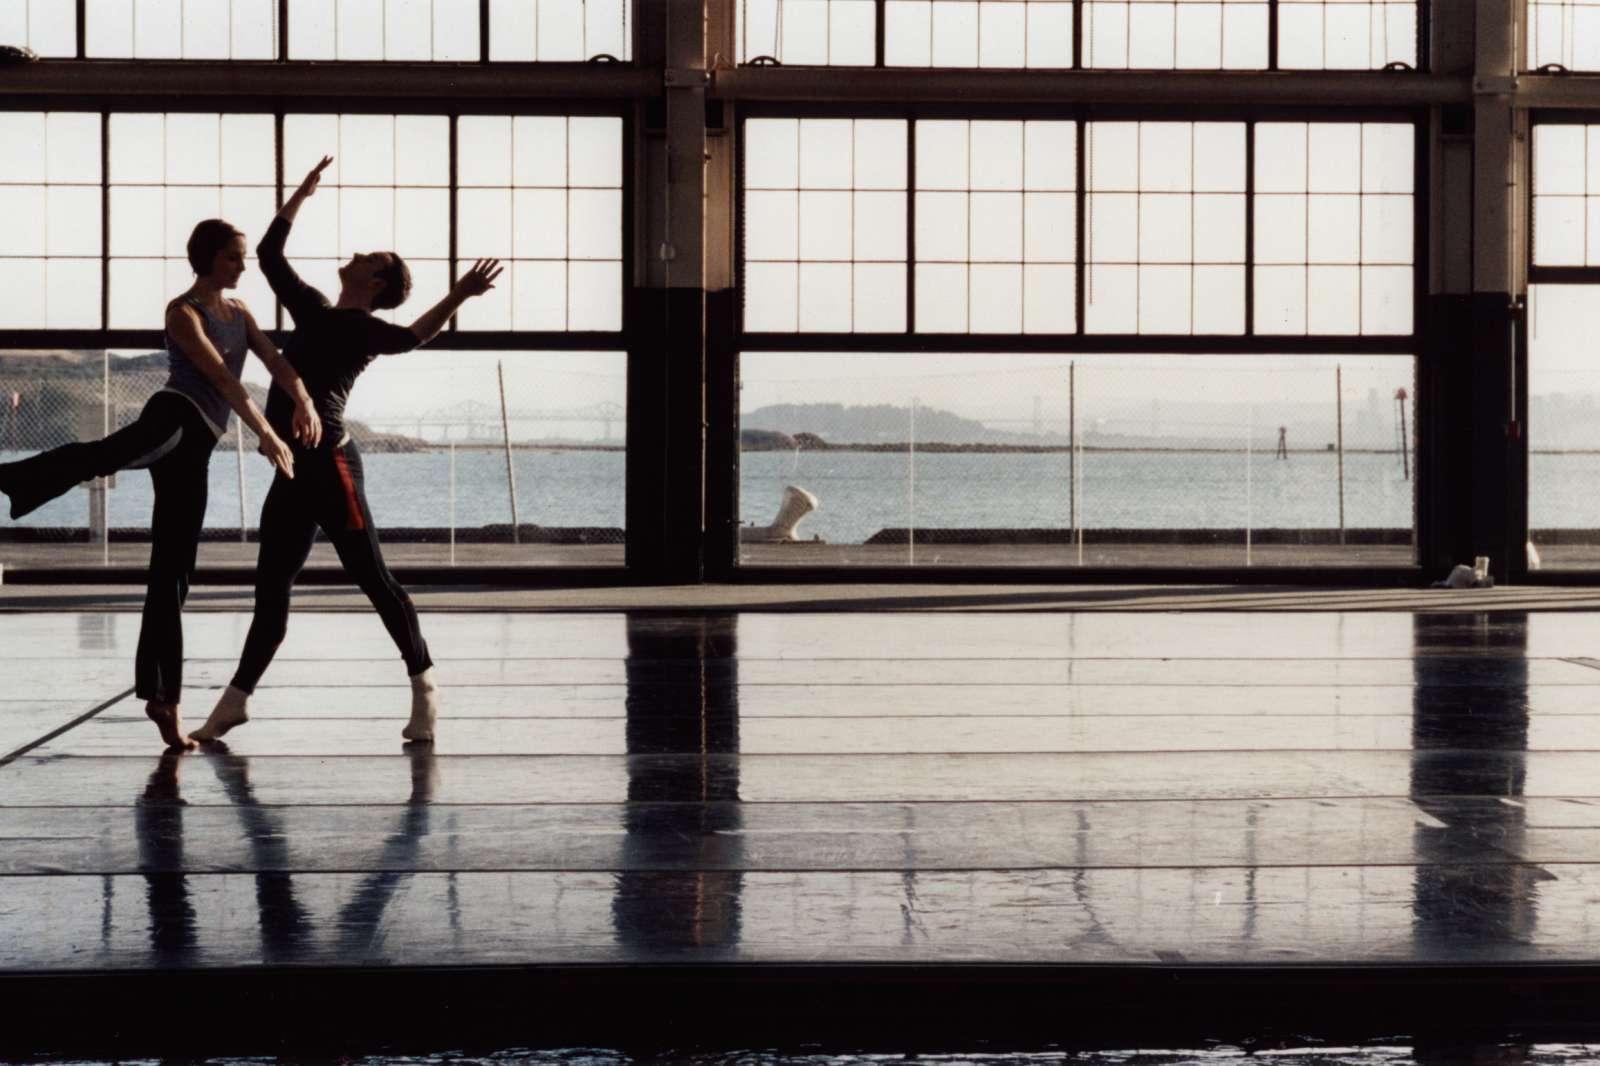 Tacita Dean, Craneway Event, 2009, 16mm anamorphic film, optical sound, 108 minutes, film still.